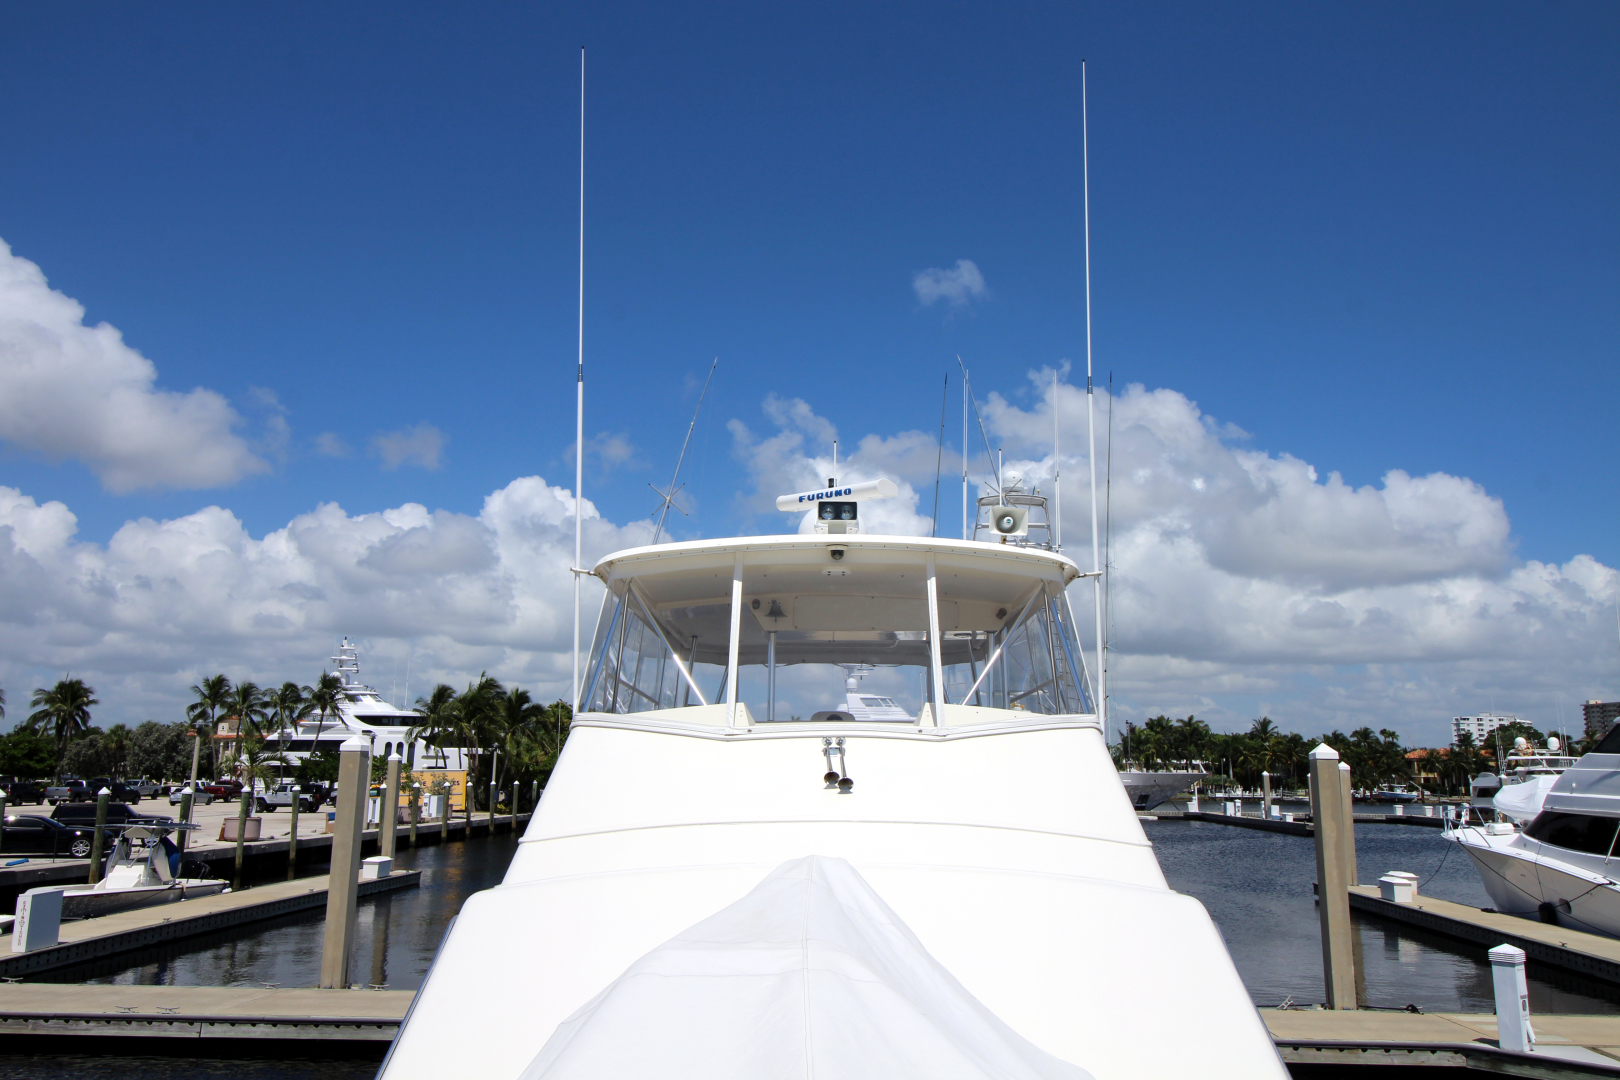 Ocean-Convertible 1989-Coho Ft Lauderdale-Florida-United States-1439889 | Thumbnail